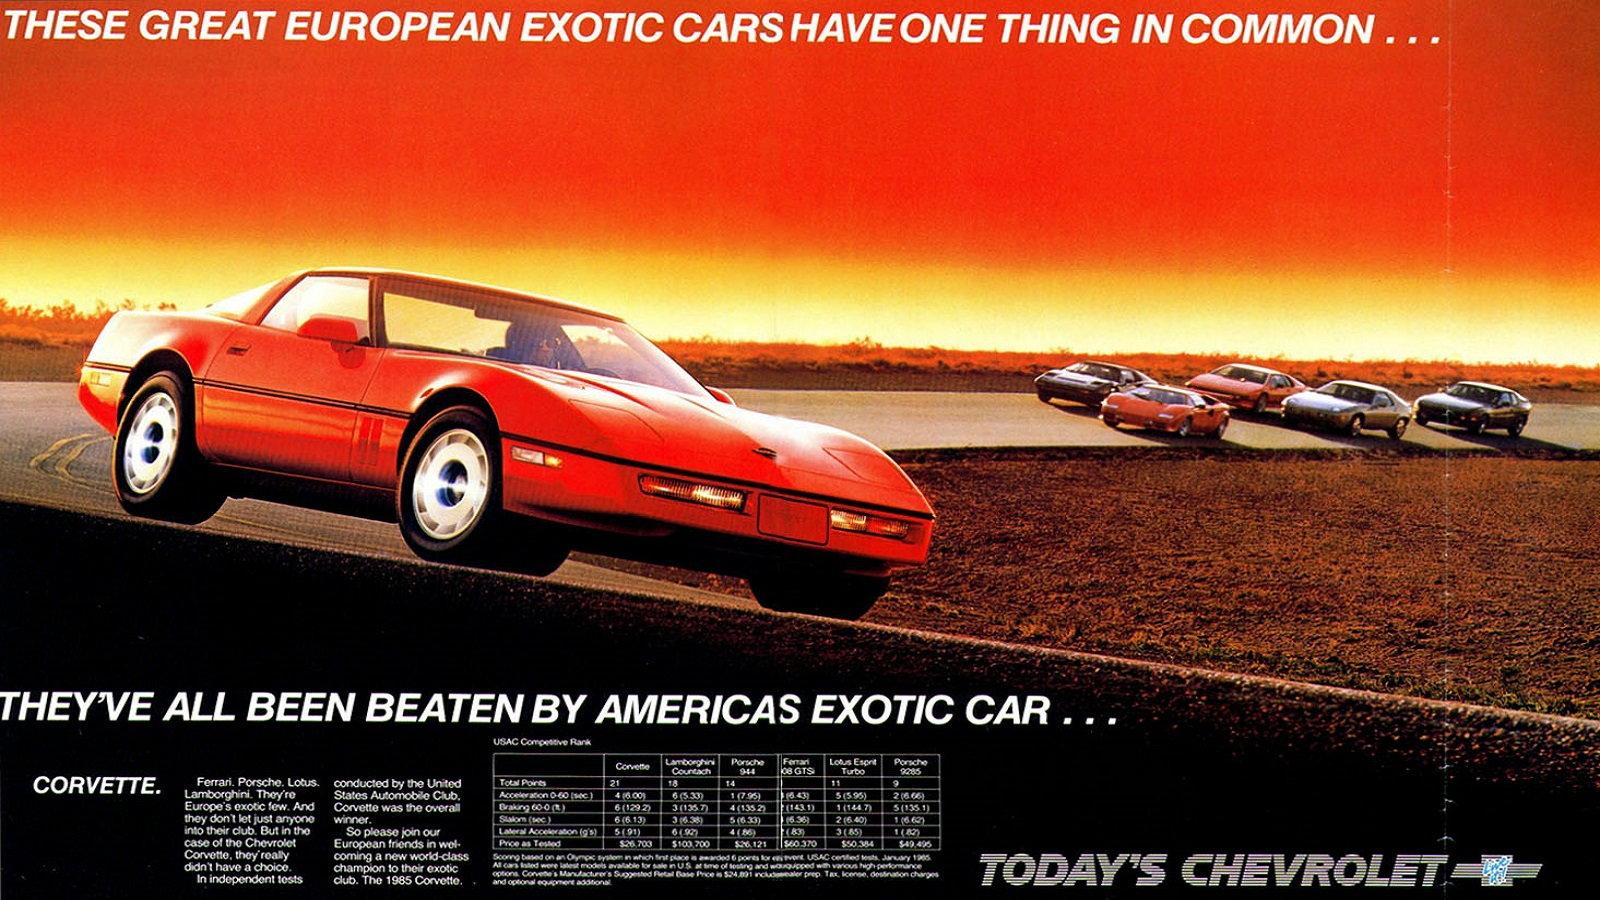 Corvette Beats the Exotics